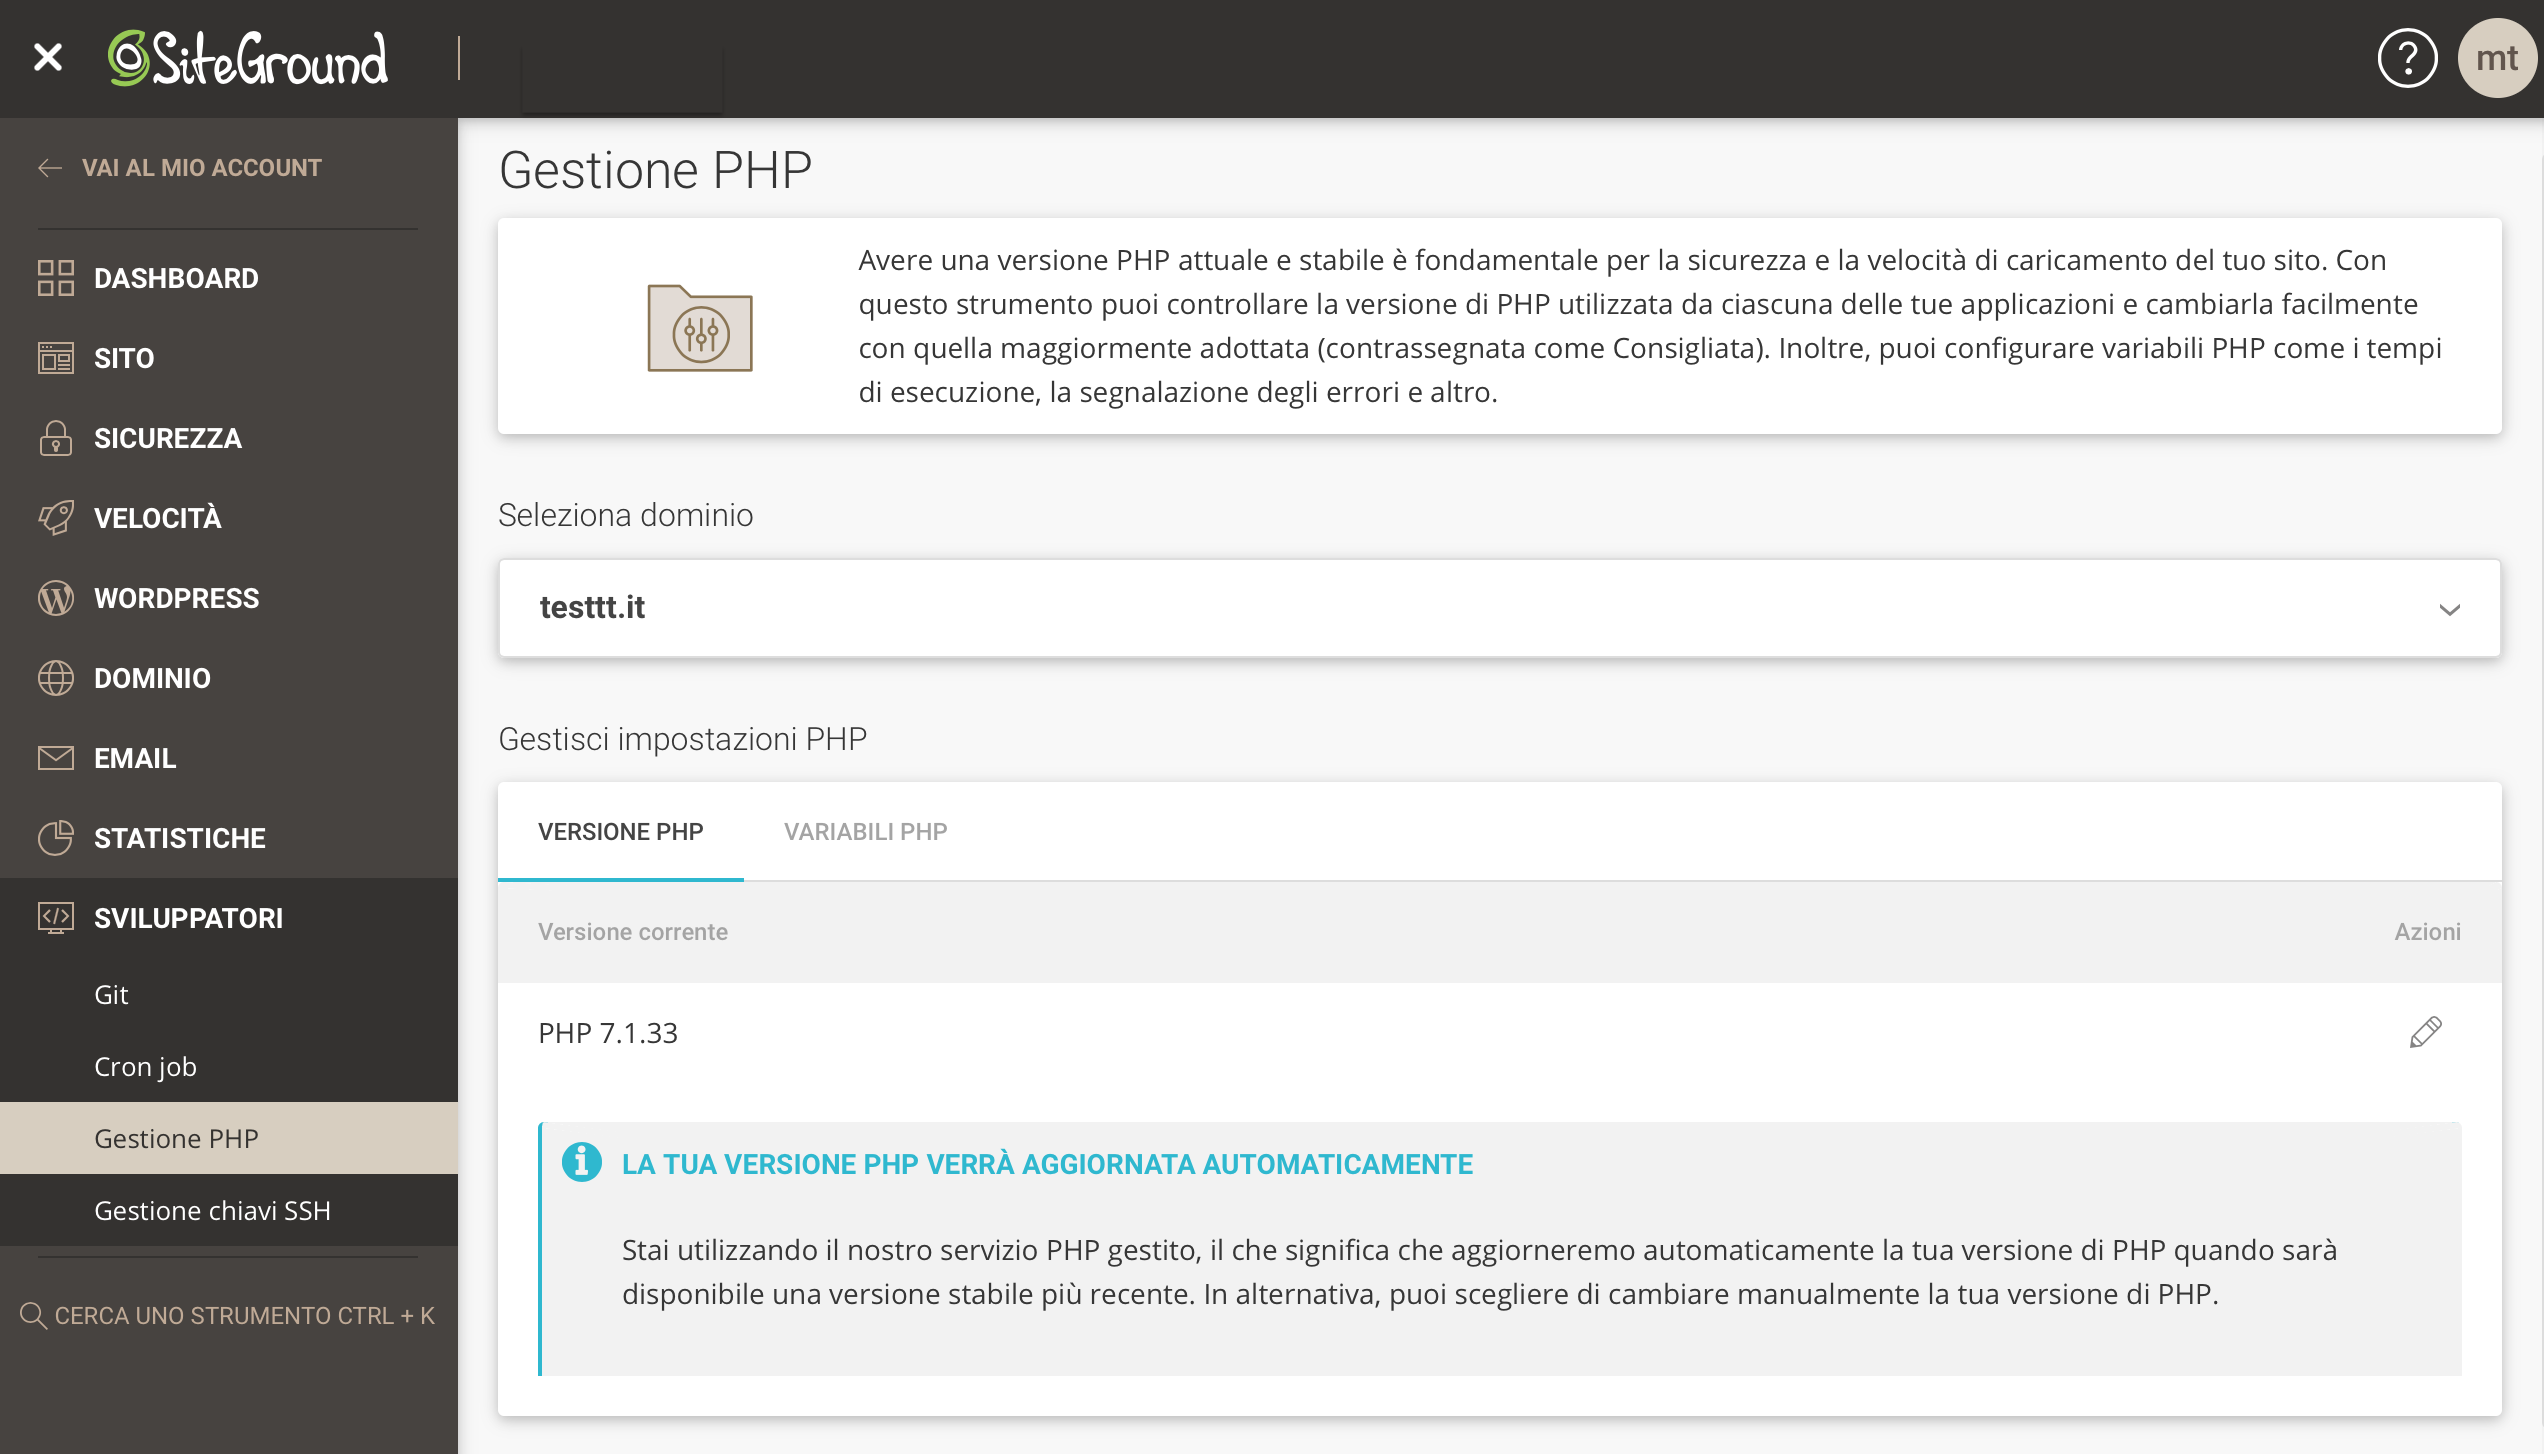 PHP gestito Site Tools